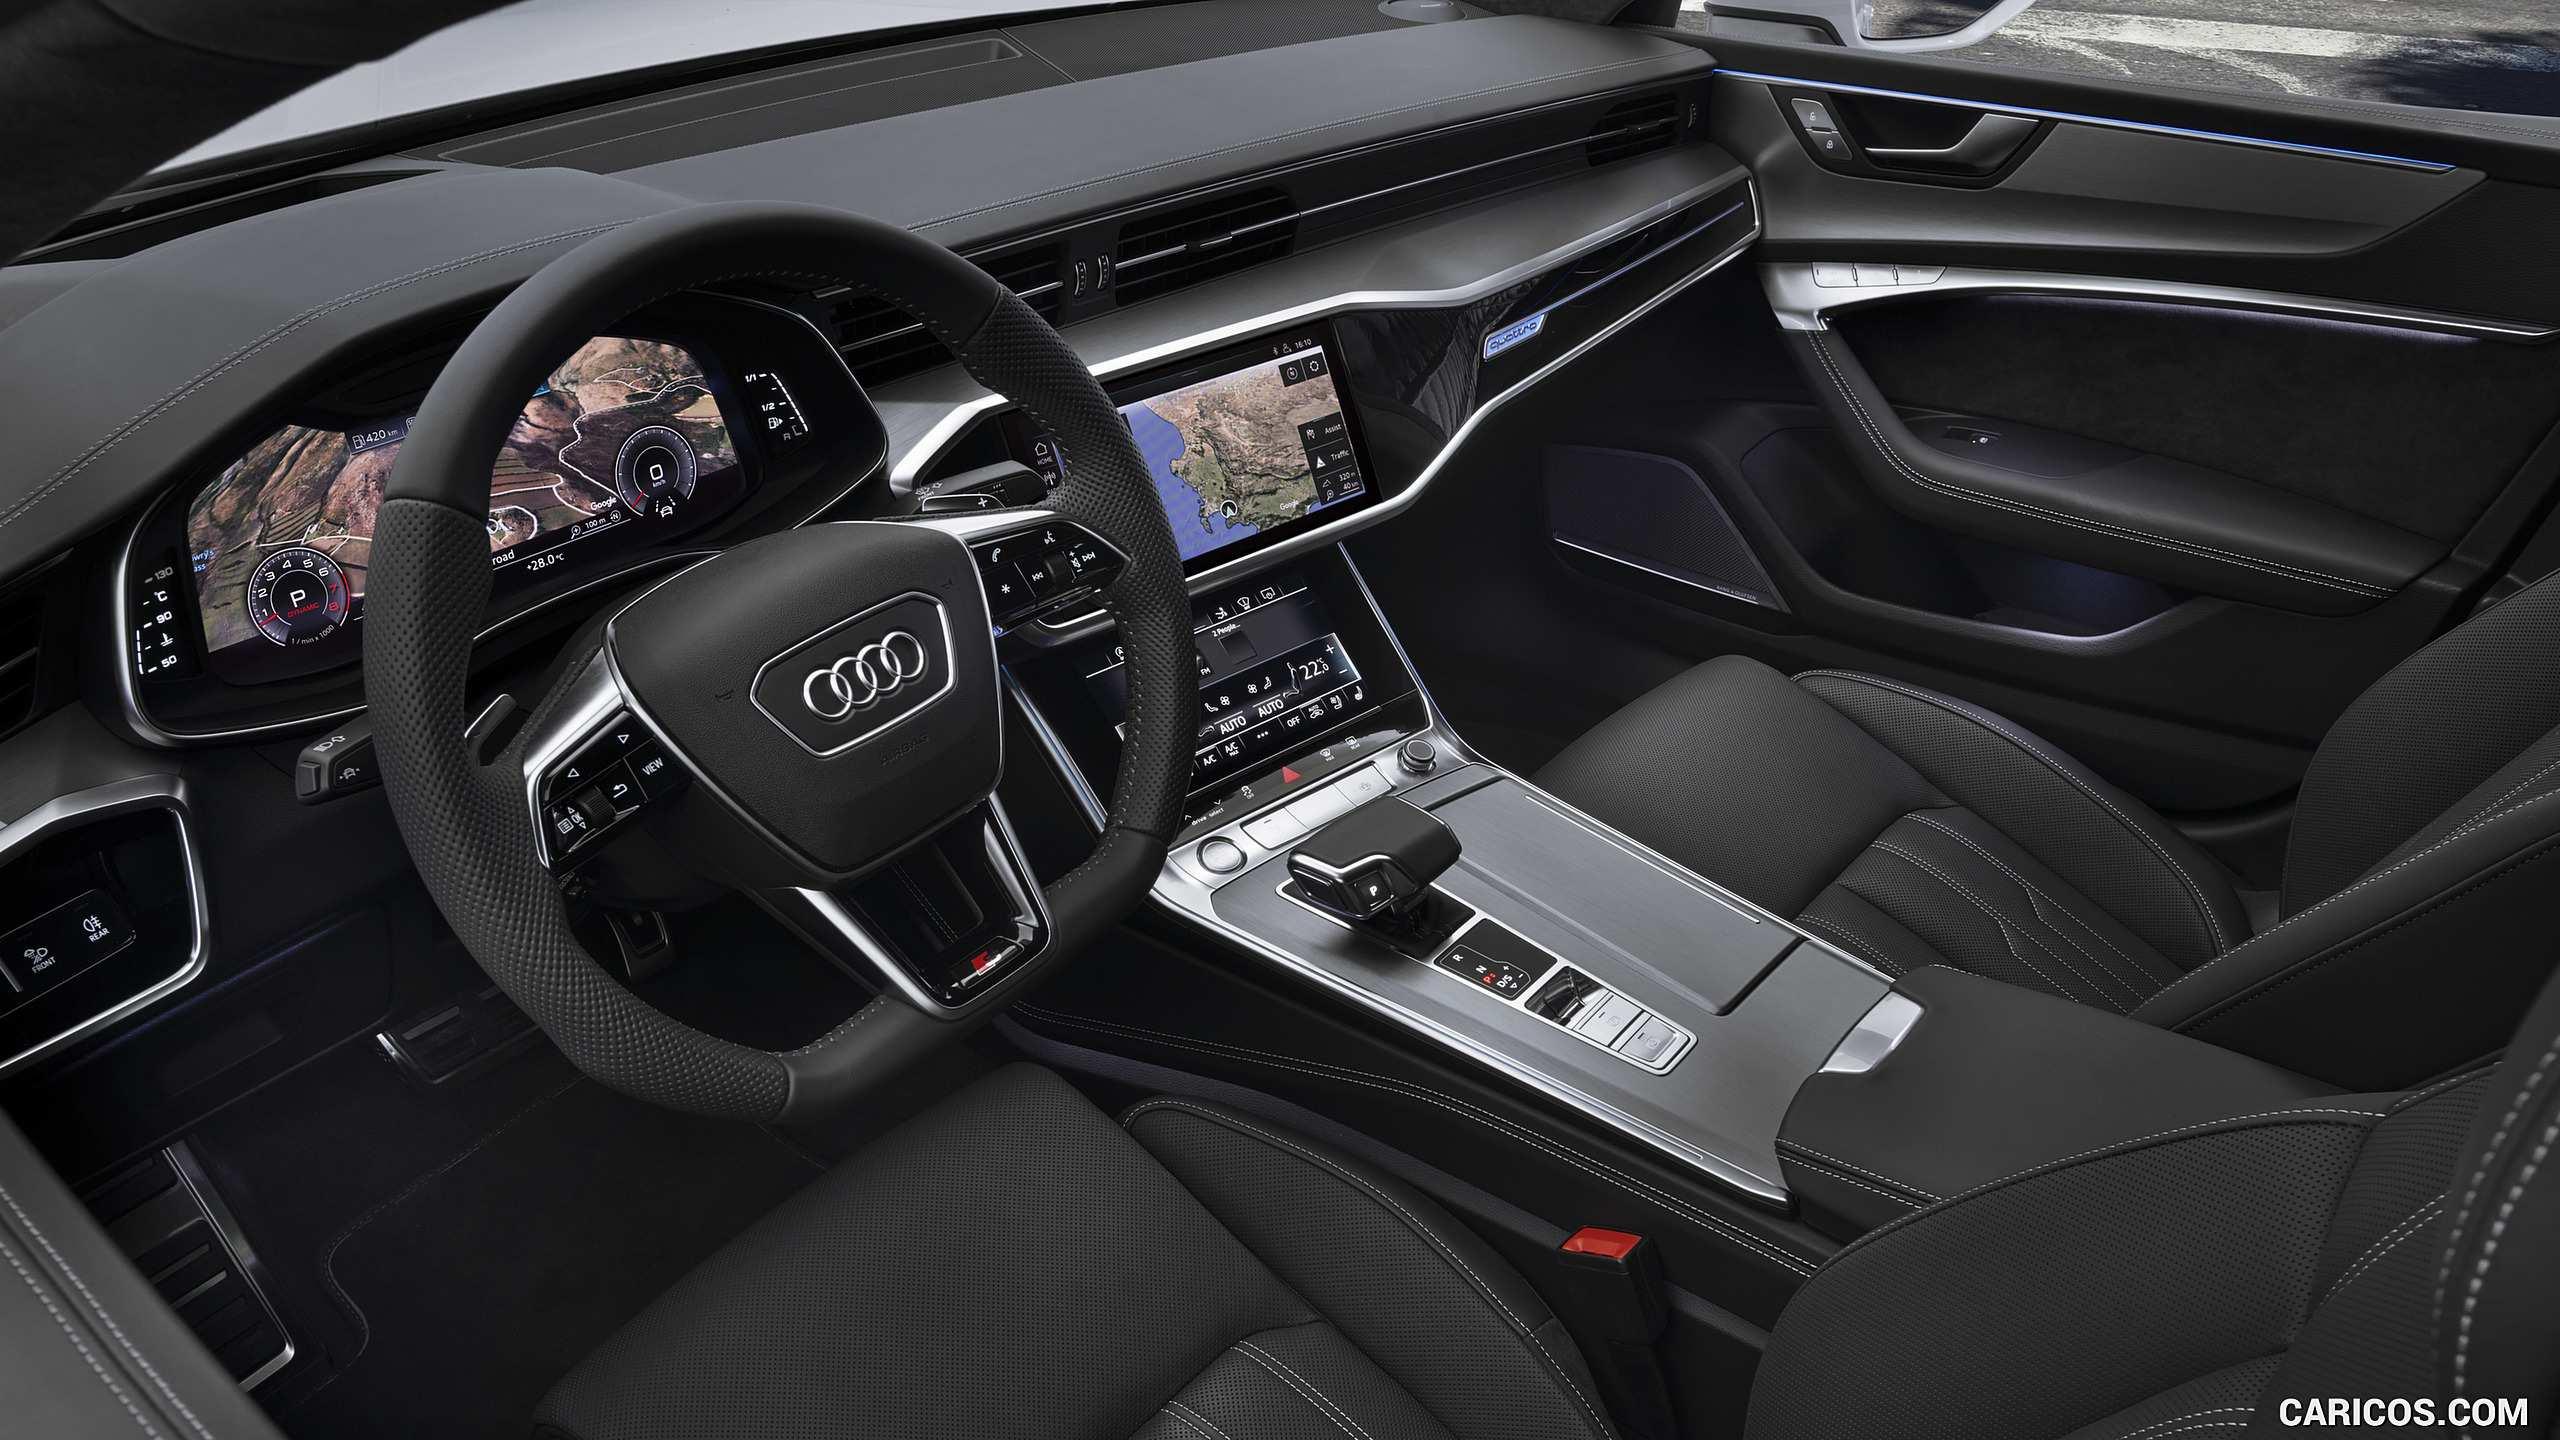 28 New 2019 Audi A7 Interior Picture with 2019 Audi A7 Interior